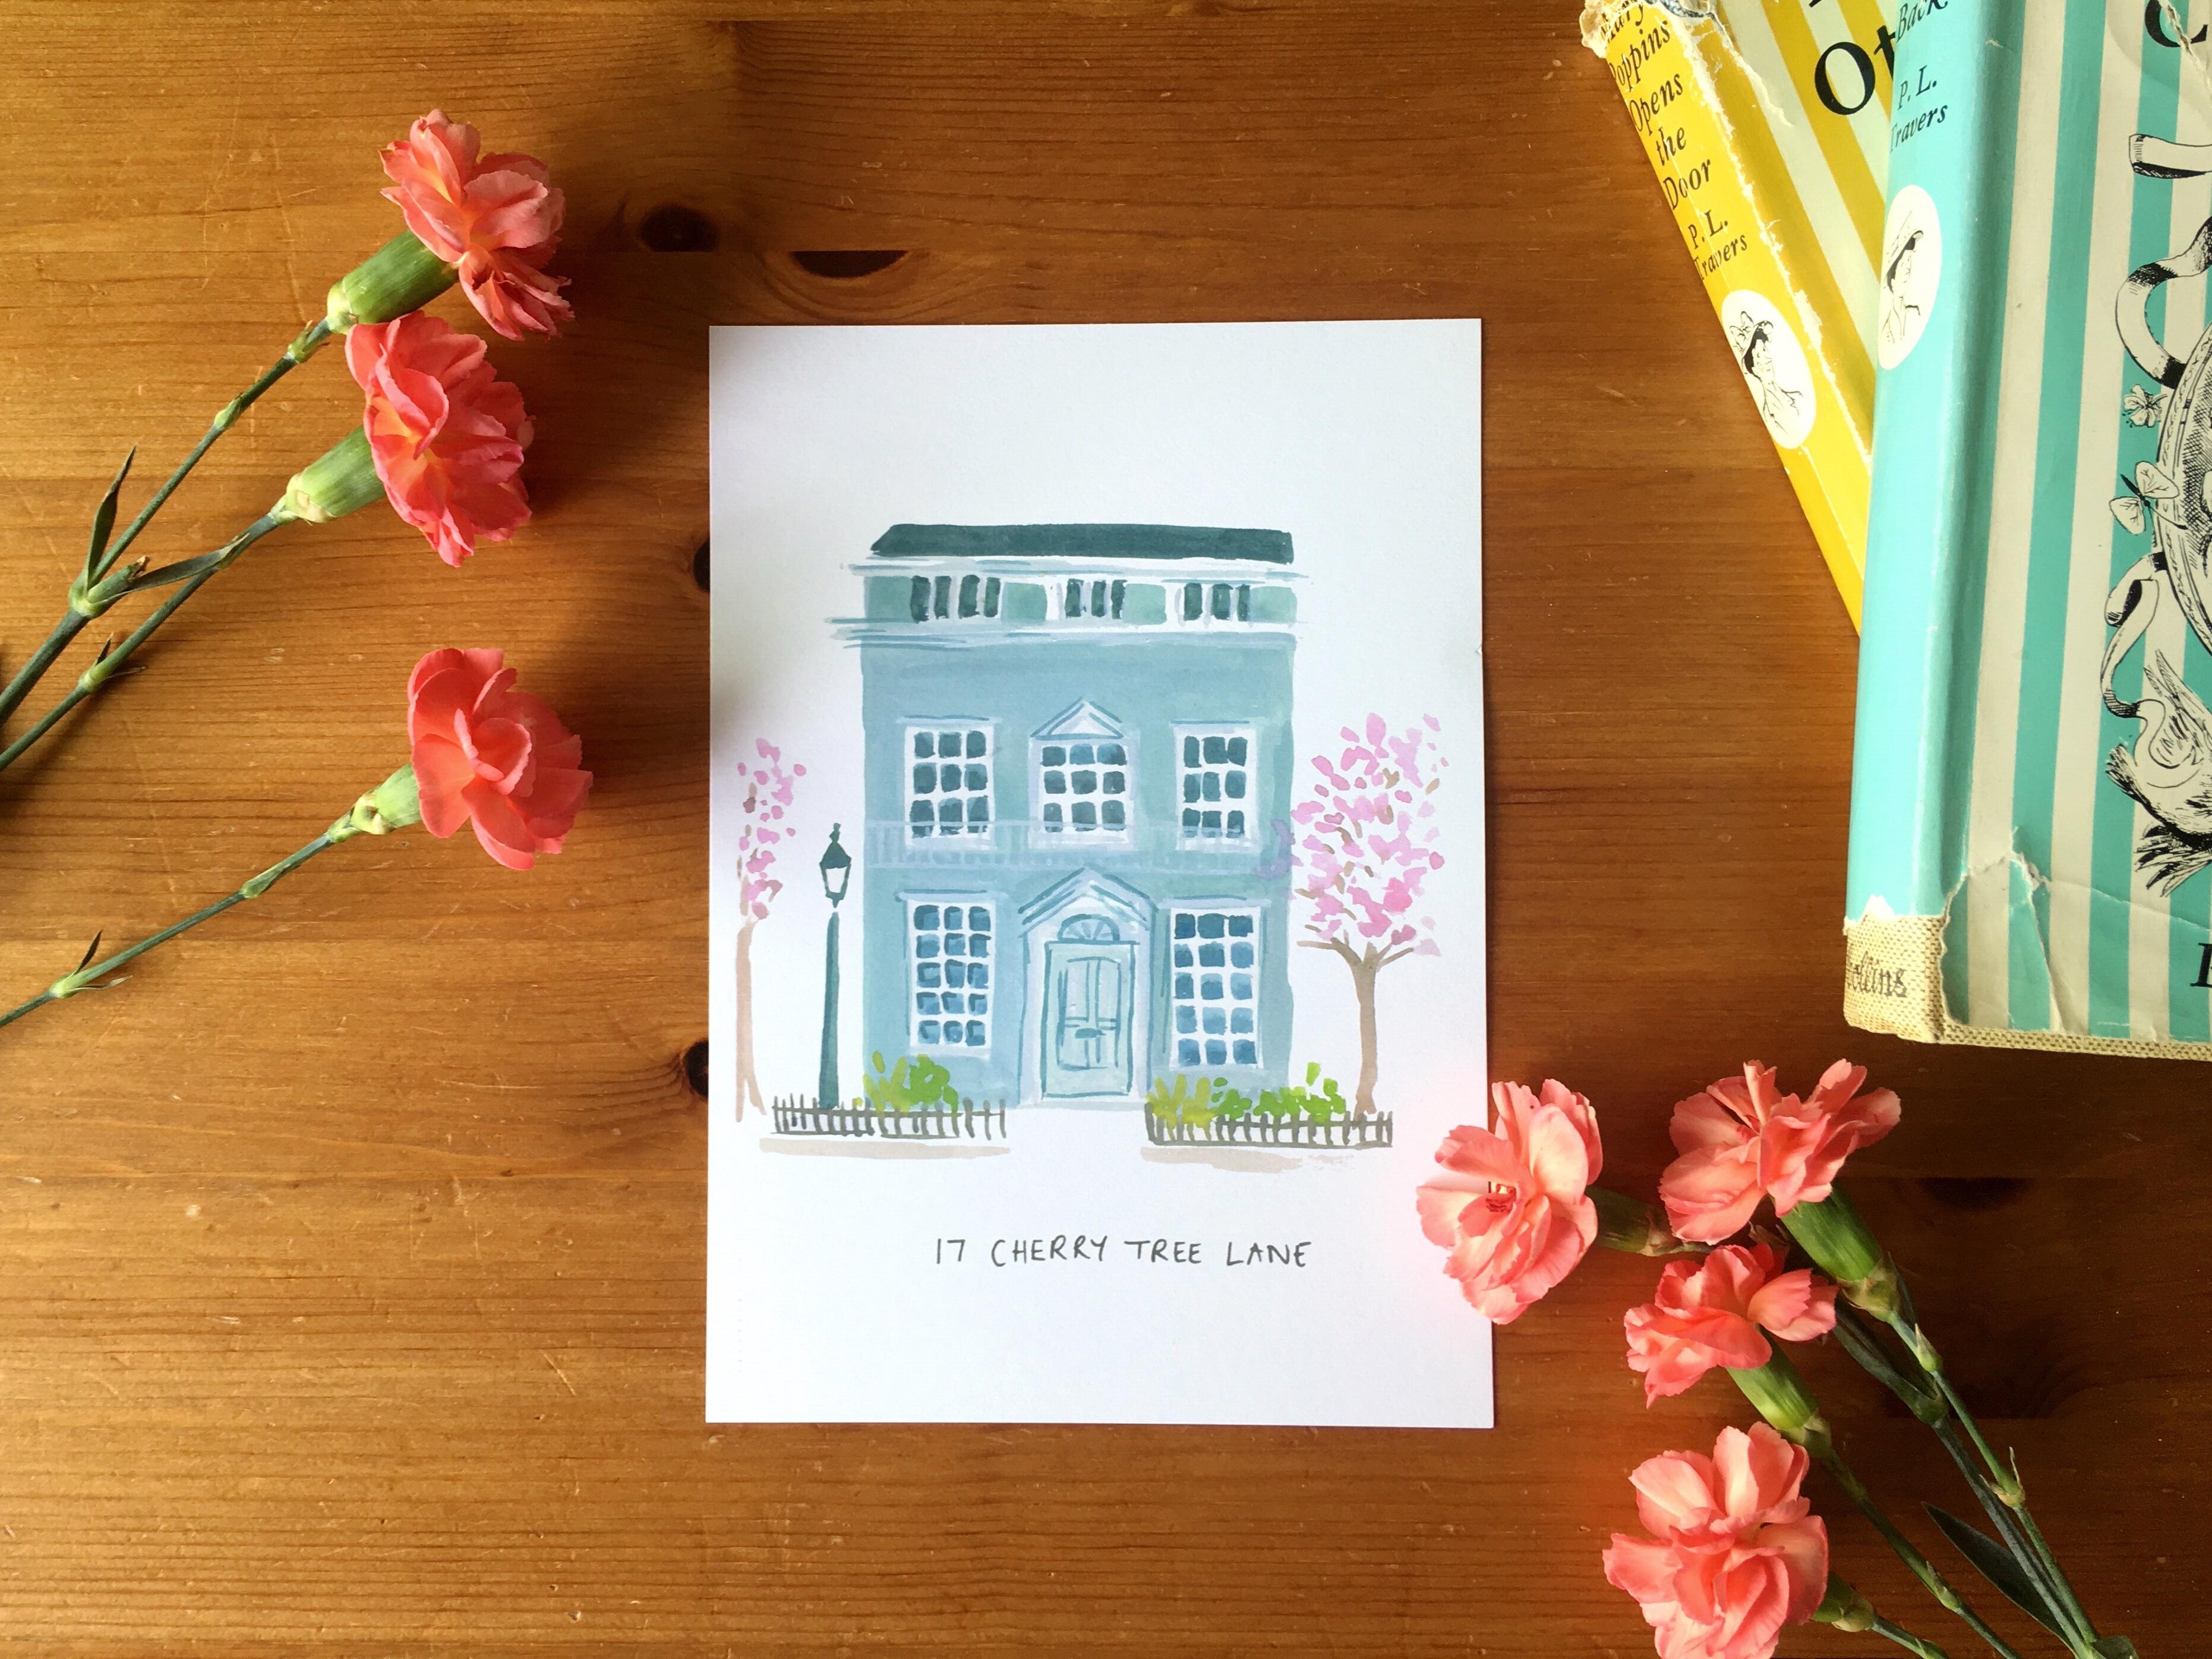 Cherry Tree Lane Mary Poppins House Print